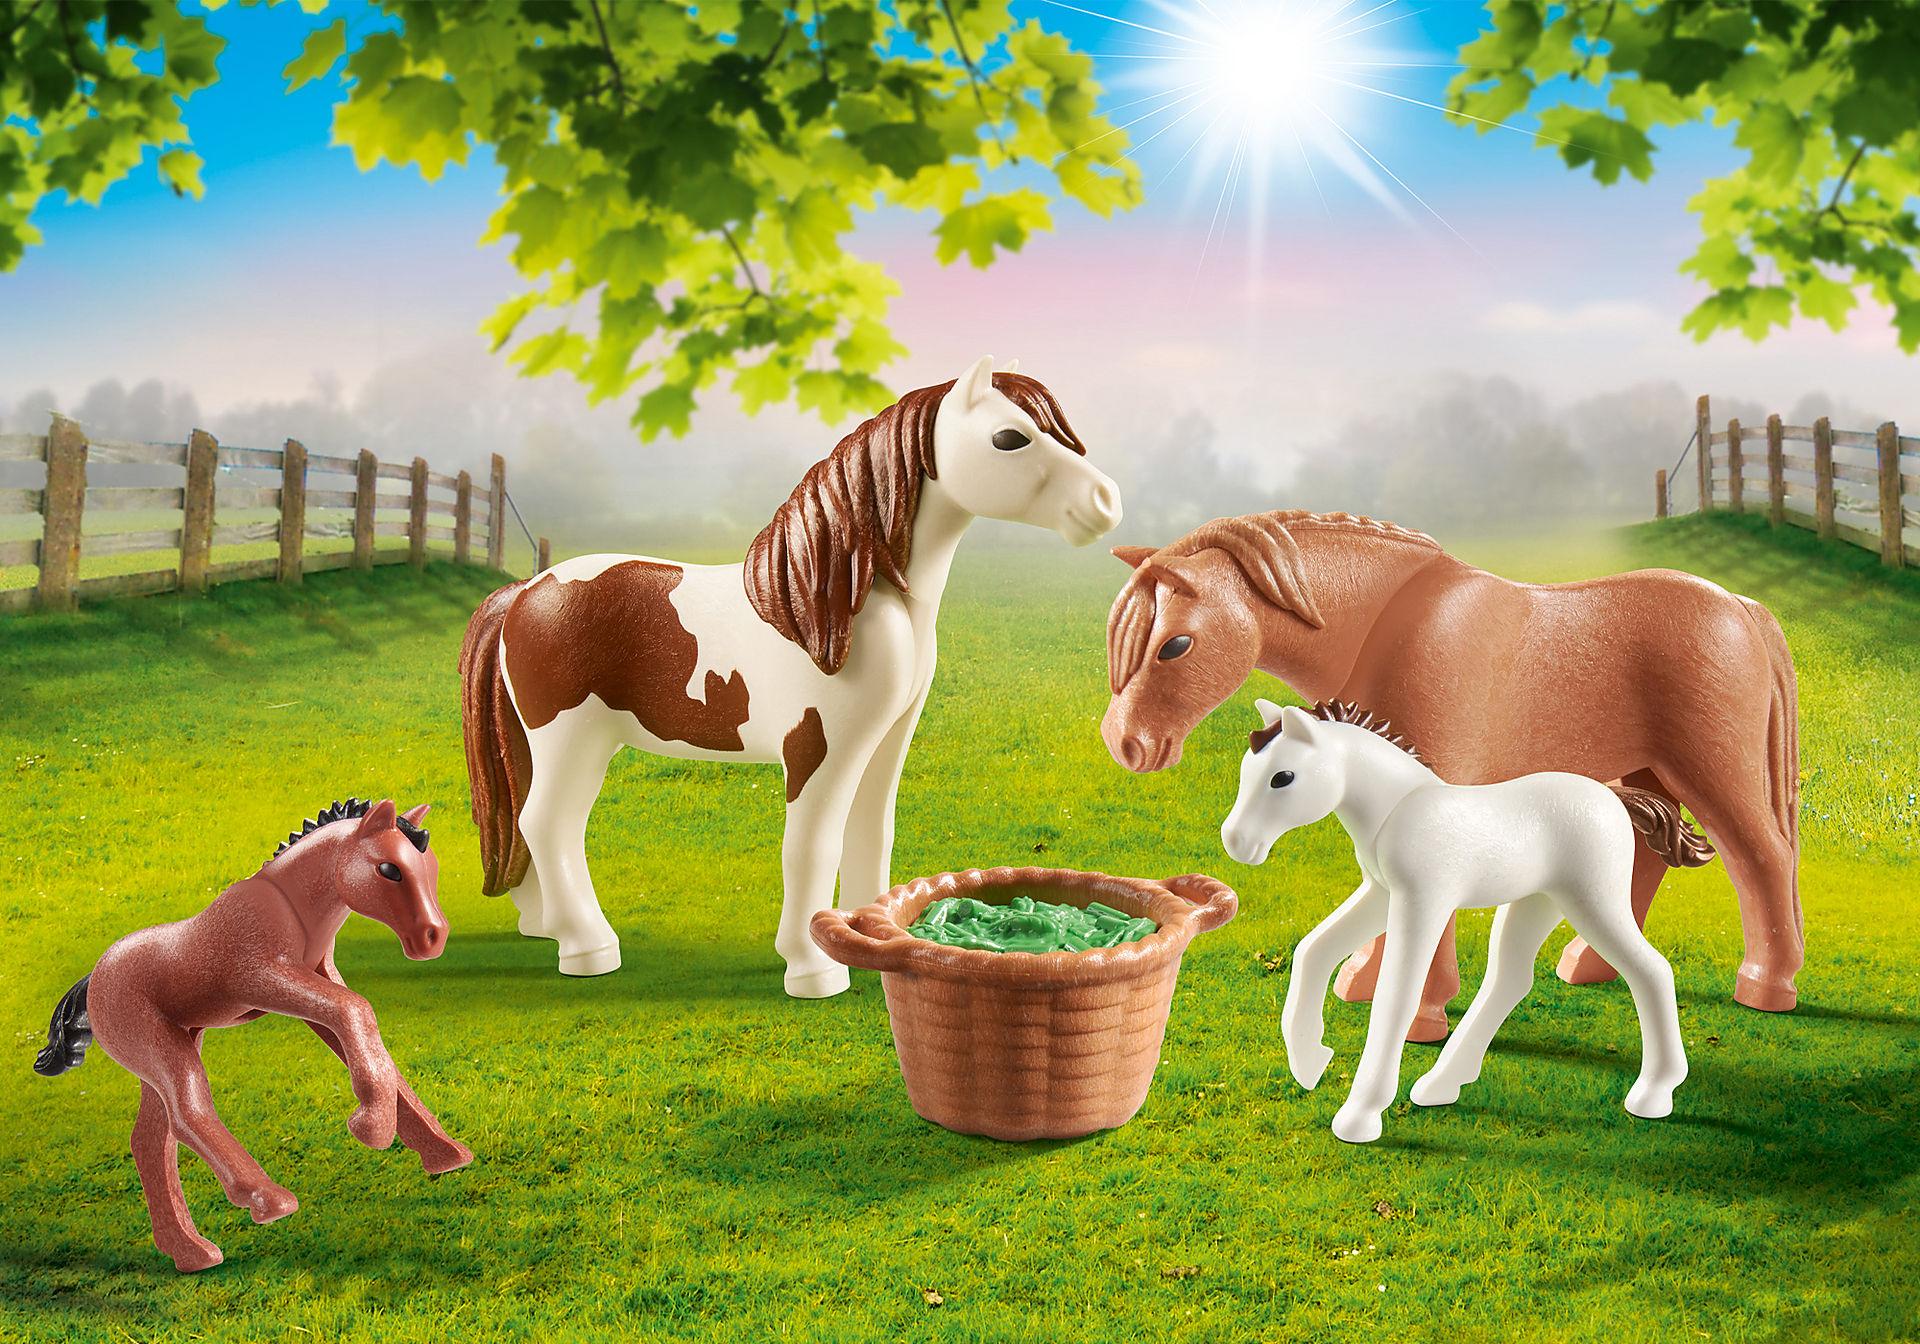 70682 Ponies with Foals zoom image1